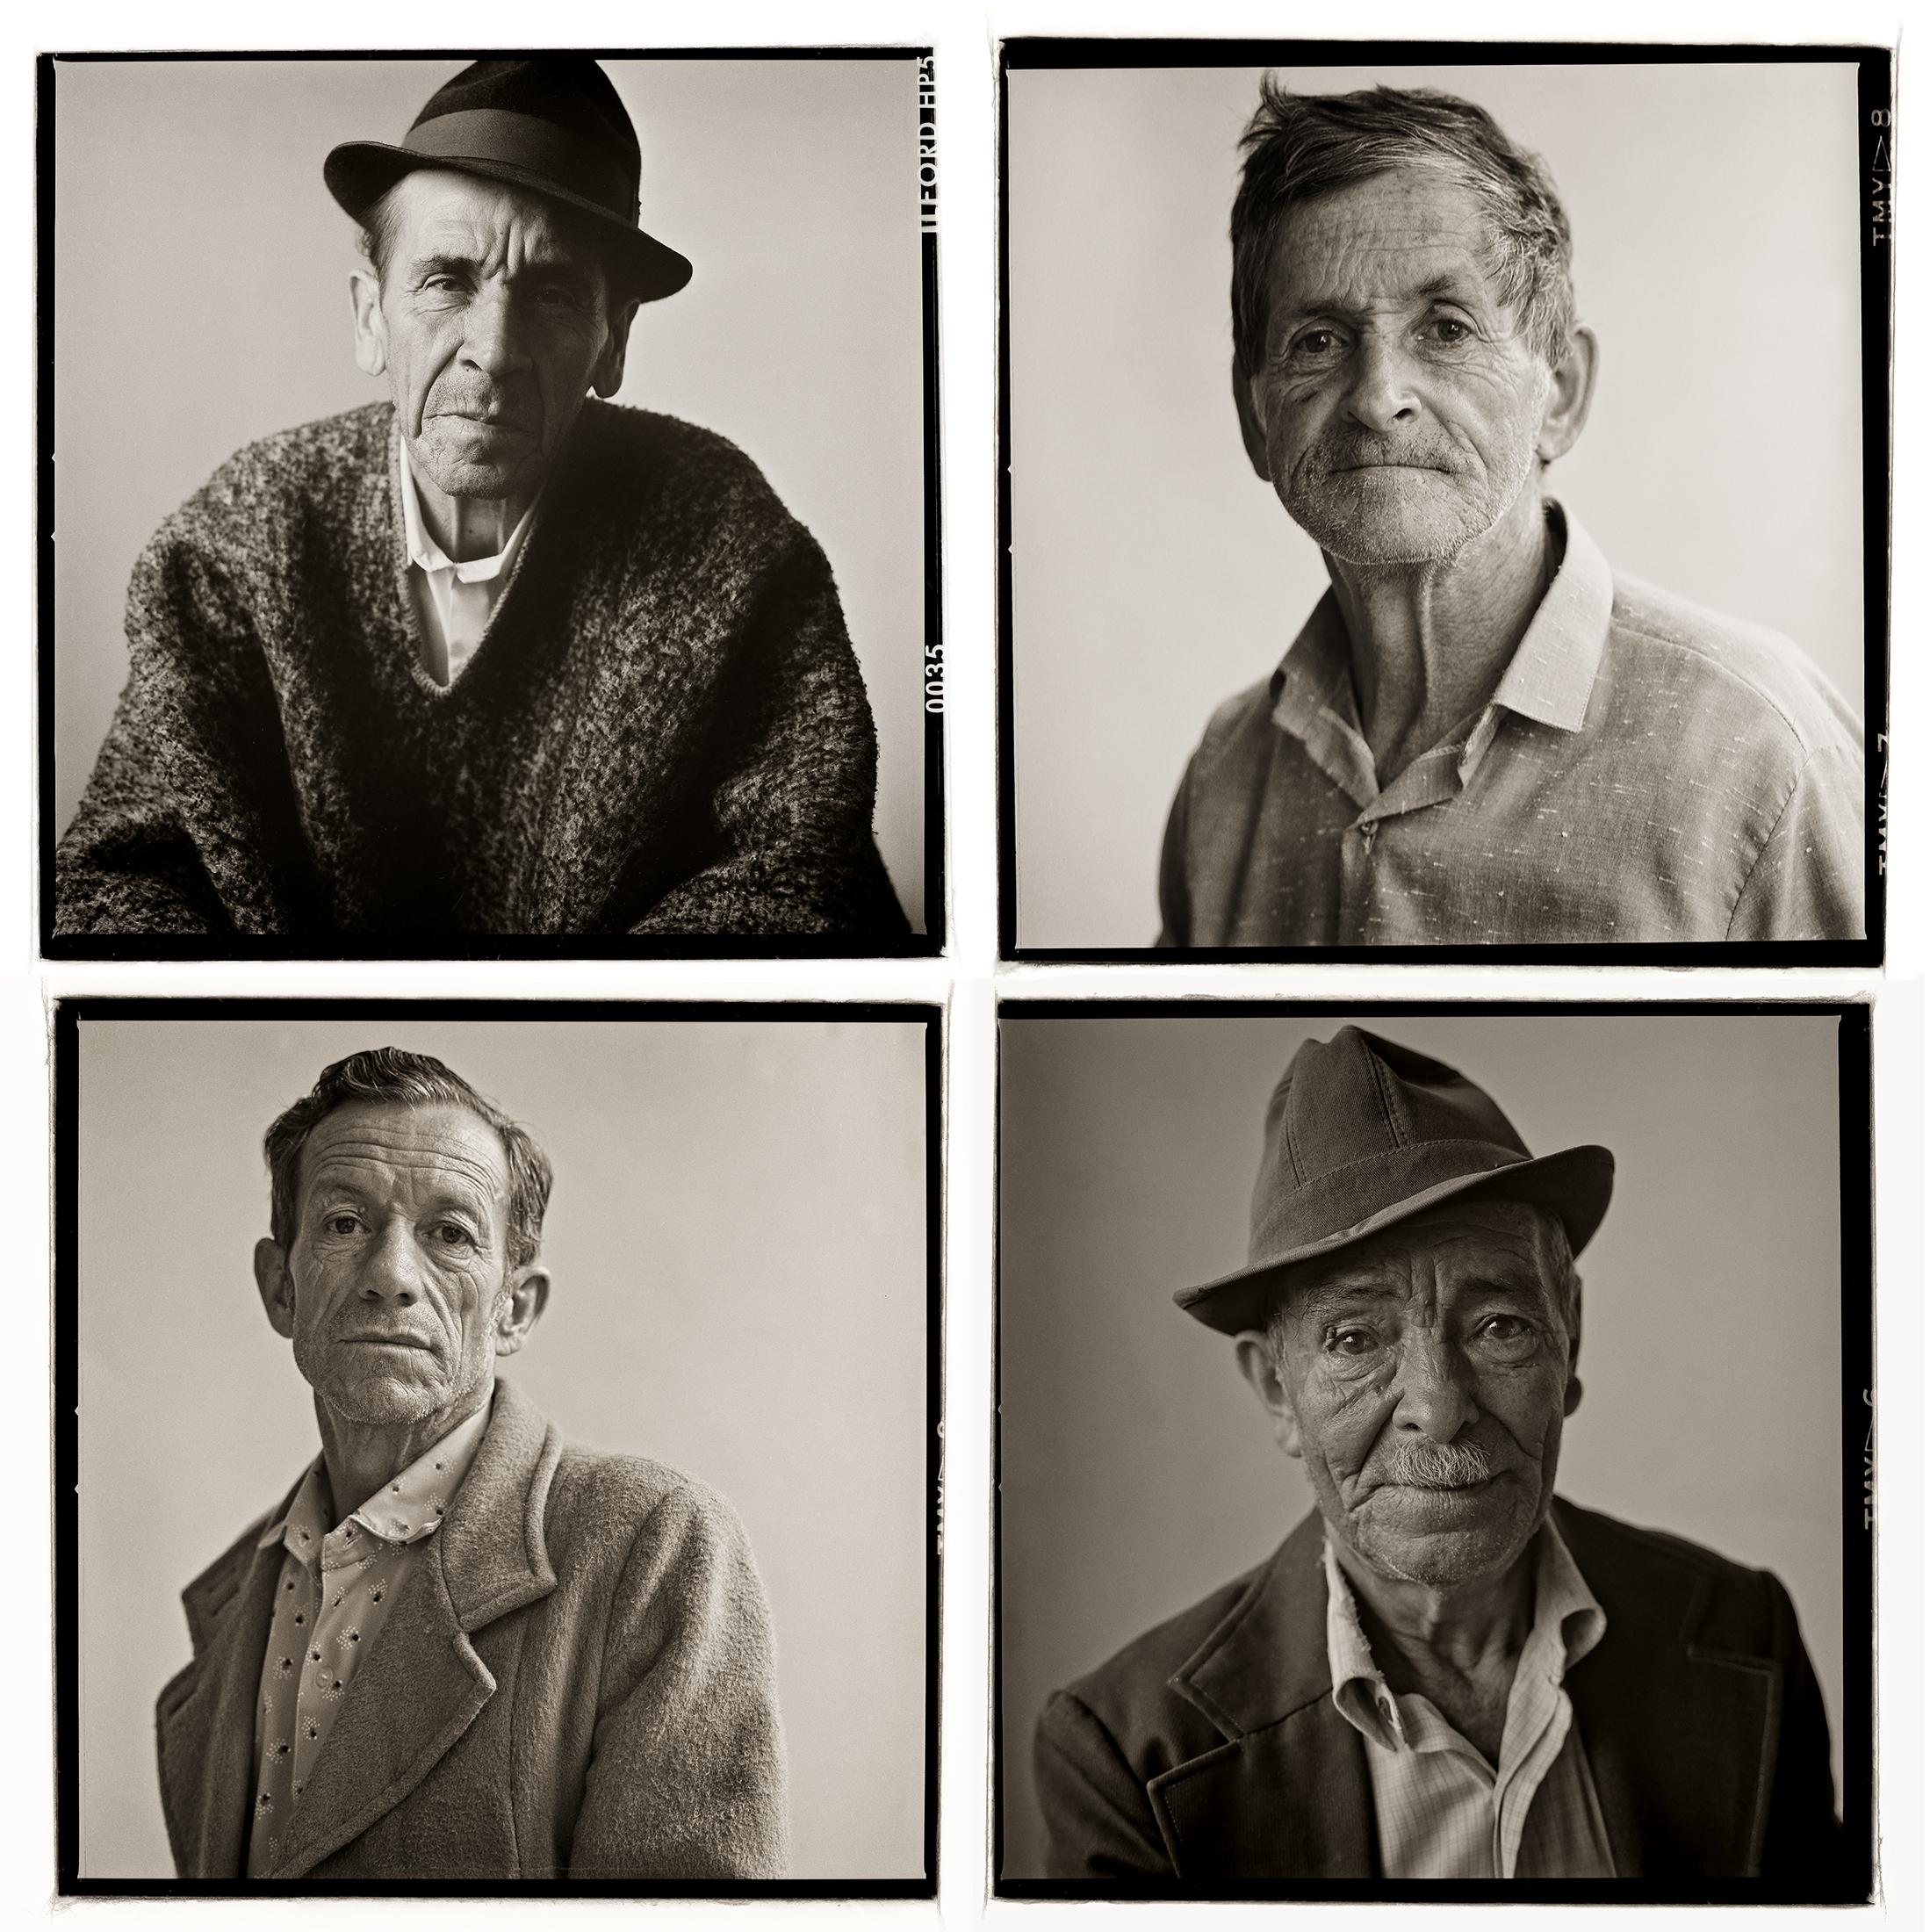 Peasant farmers, Manizales, Colombia 1988-89.